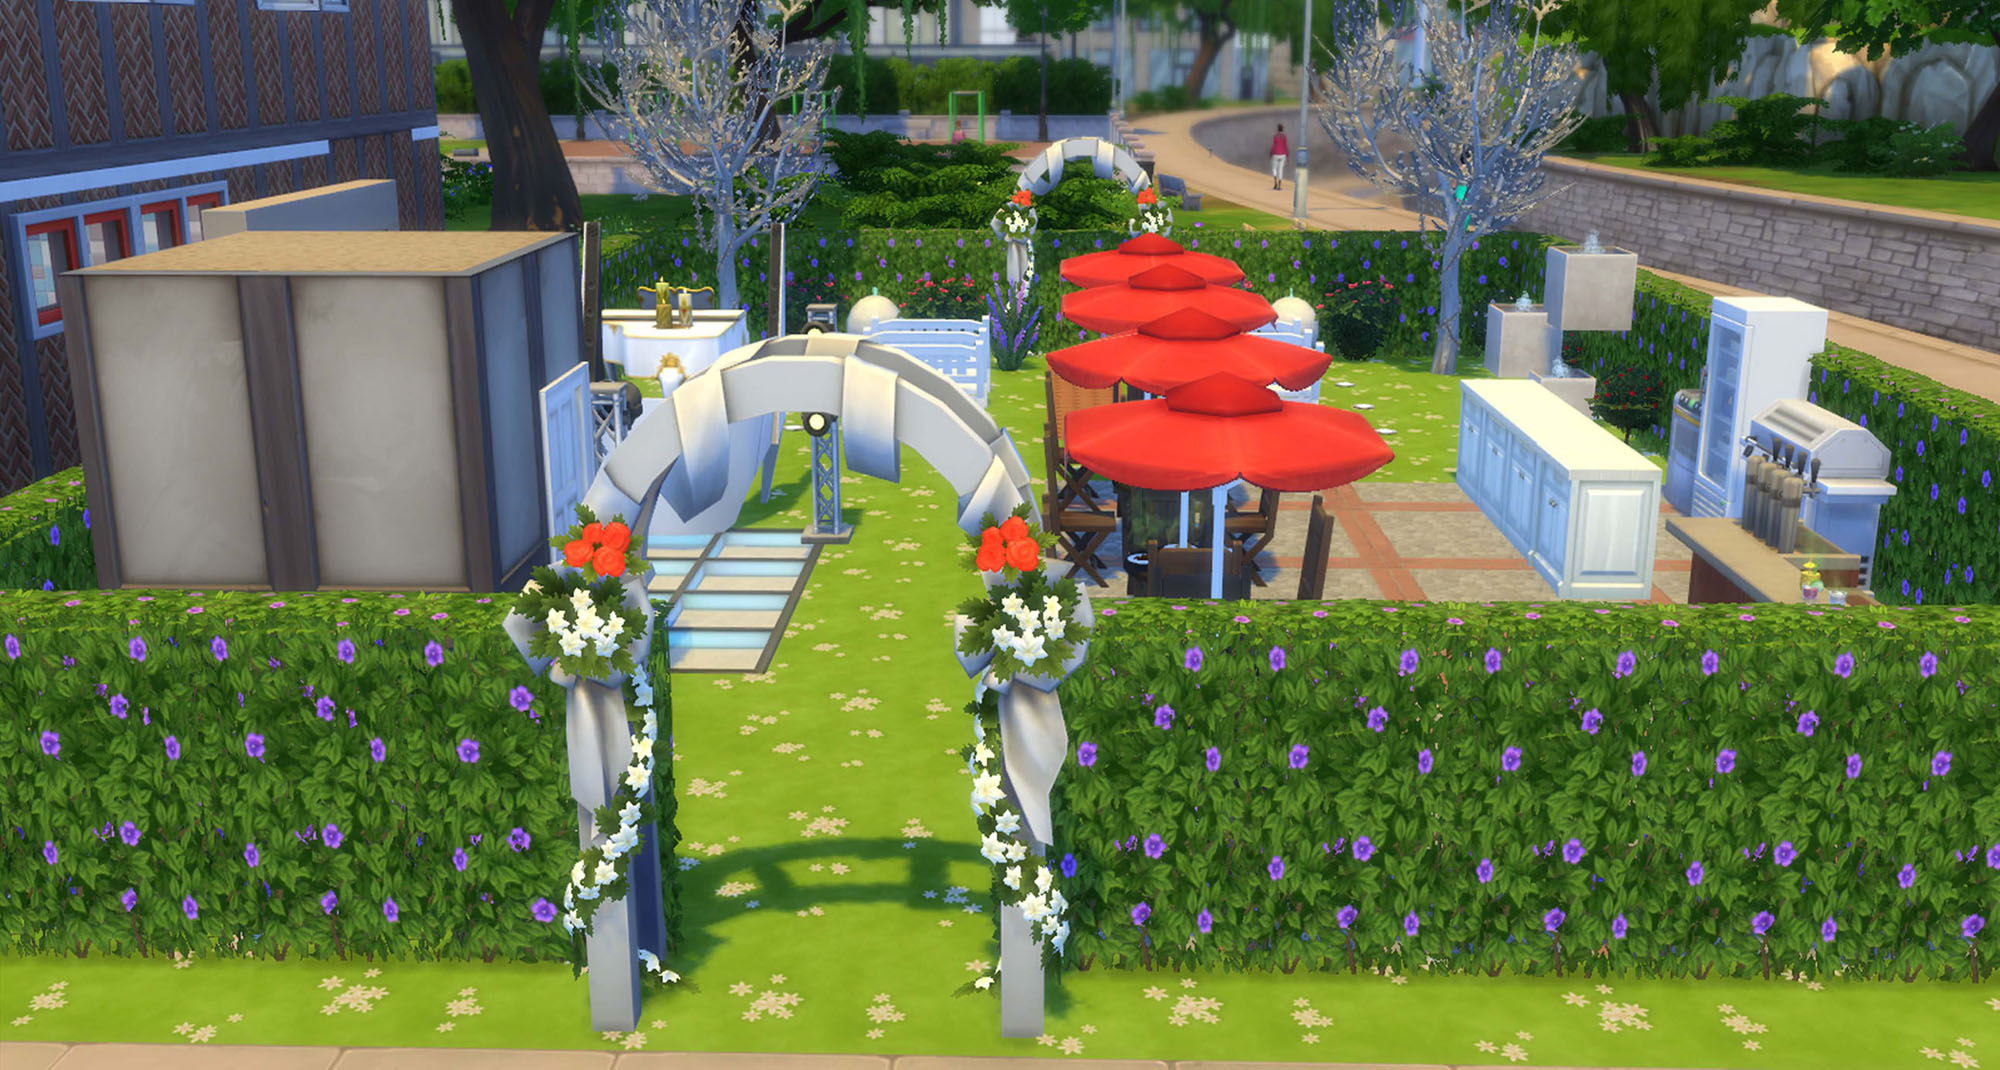 Mod The Sims - Wedding Park- Community Lot 20x15